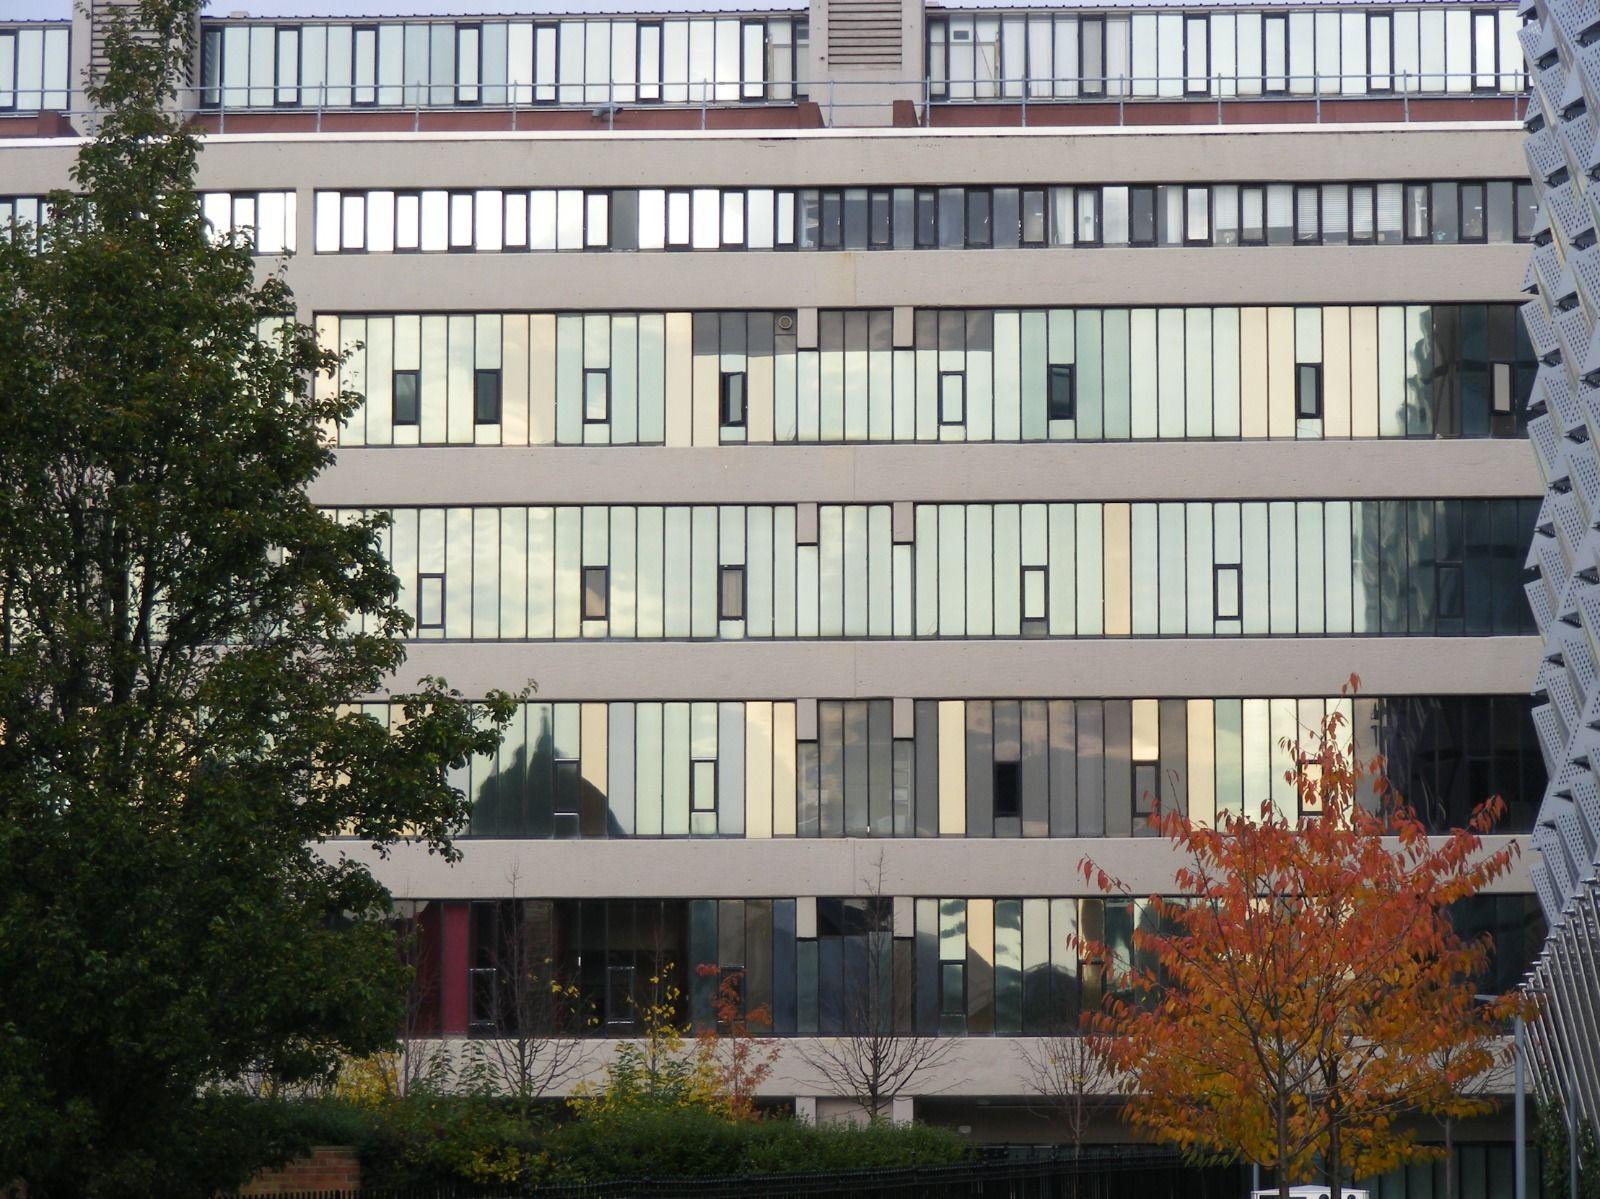 University Campus, Leeds